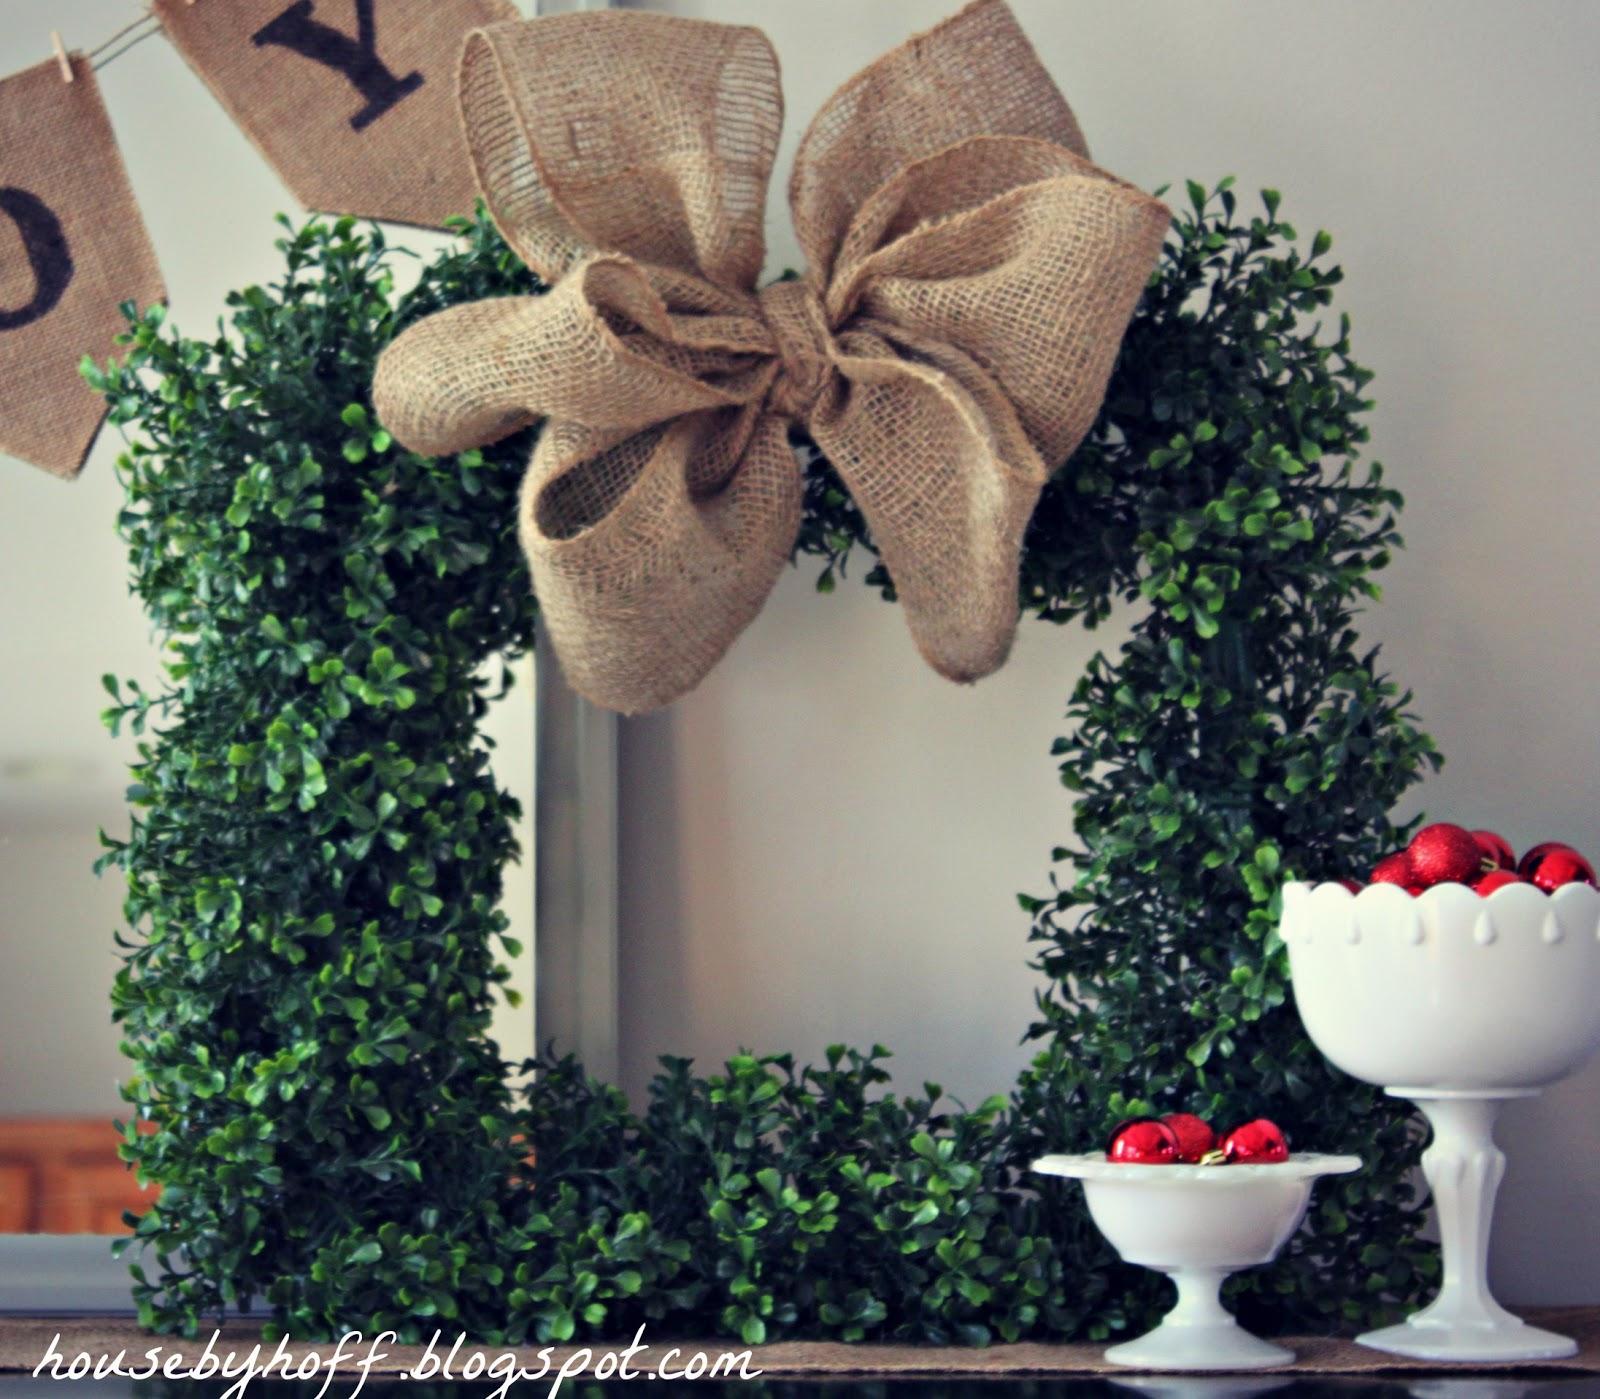 how to make a square boxwood wreath with burlap bow via housebyhoffcom - How To Make A Christmas Bow For A Wreath